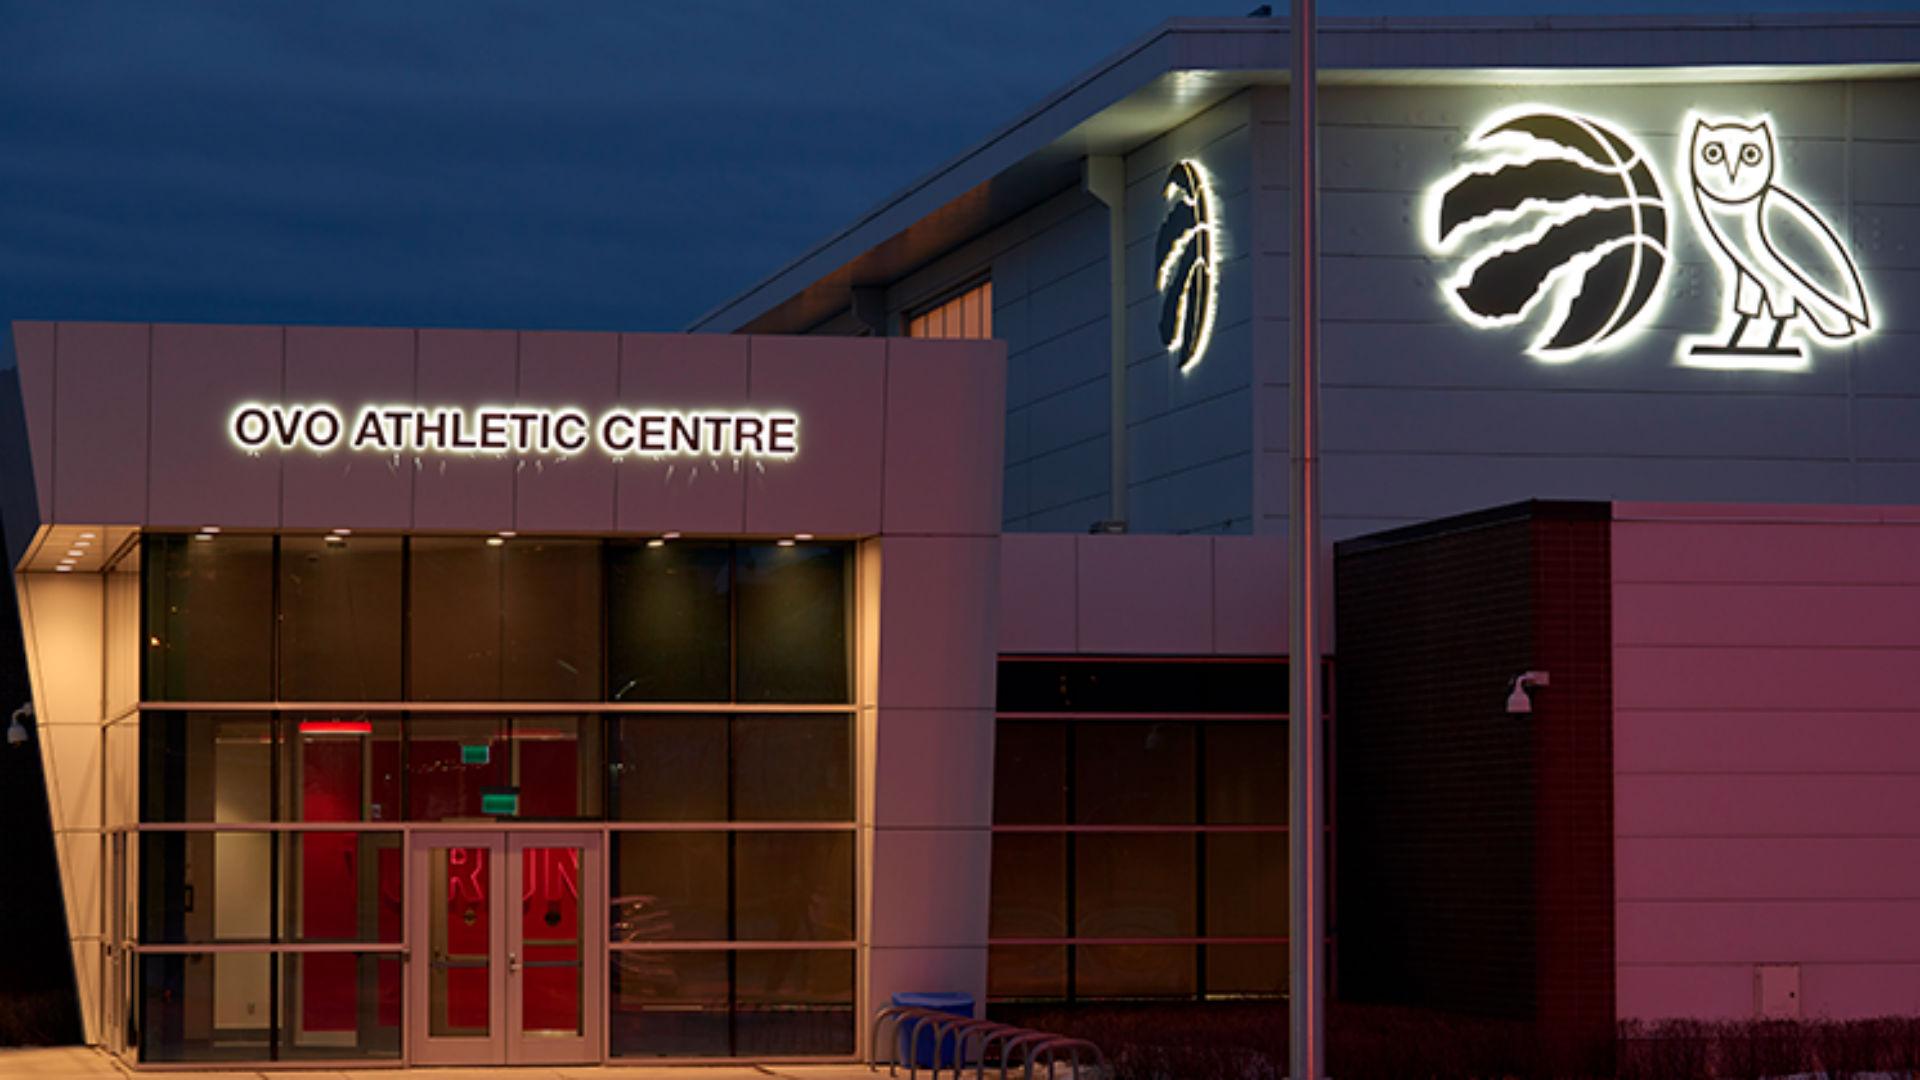 Toronto Raptors Training Facility Officially Rebranded